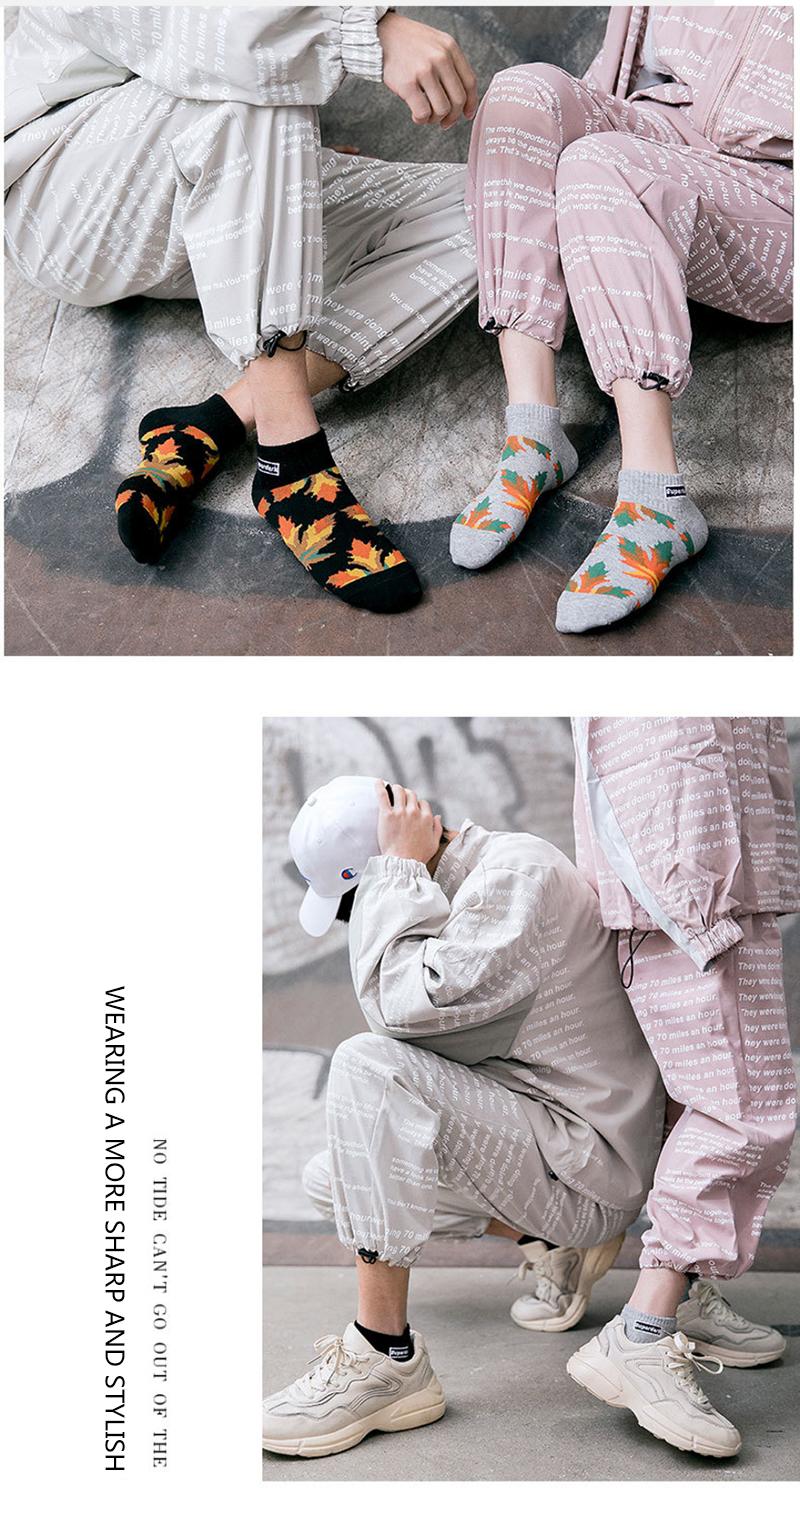 Mens Socks Casual Comfort Cotton Socks Cartoon Fashion Hip Hop Skateboard Boy Fake Laugh Funny Socks Mens Personality Fashion Underwear & Sleepwears